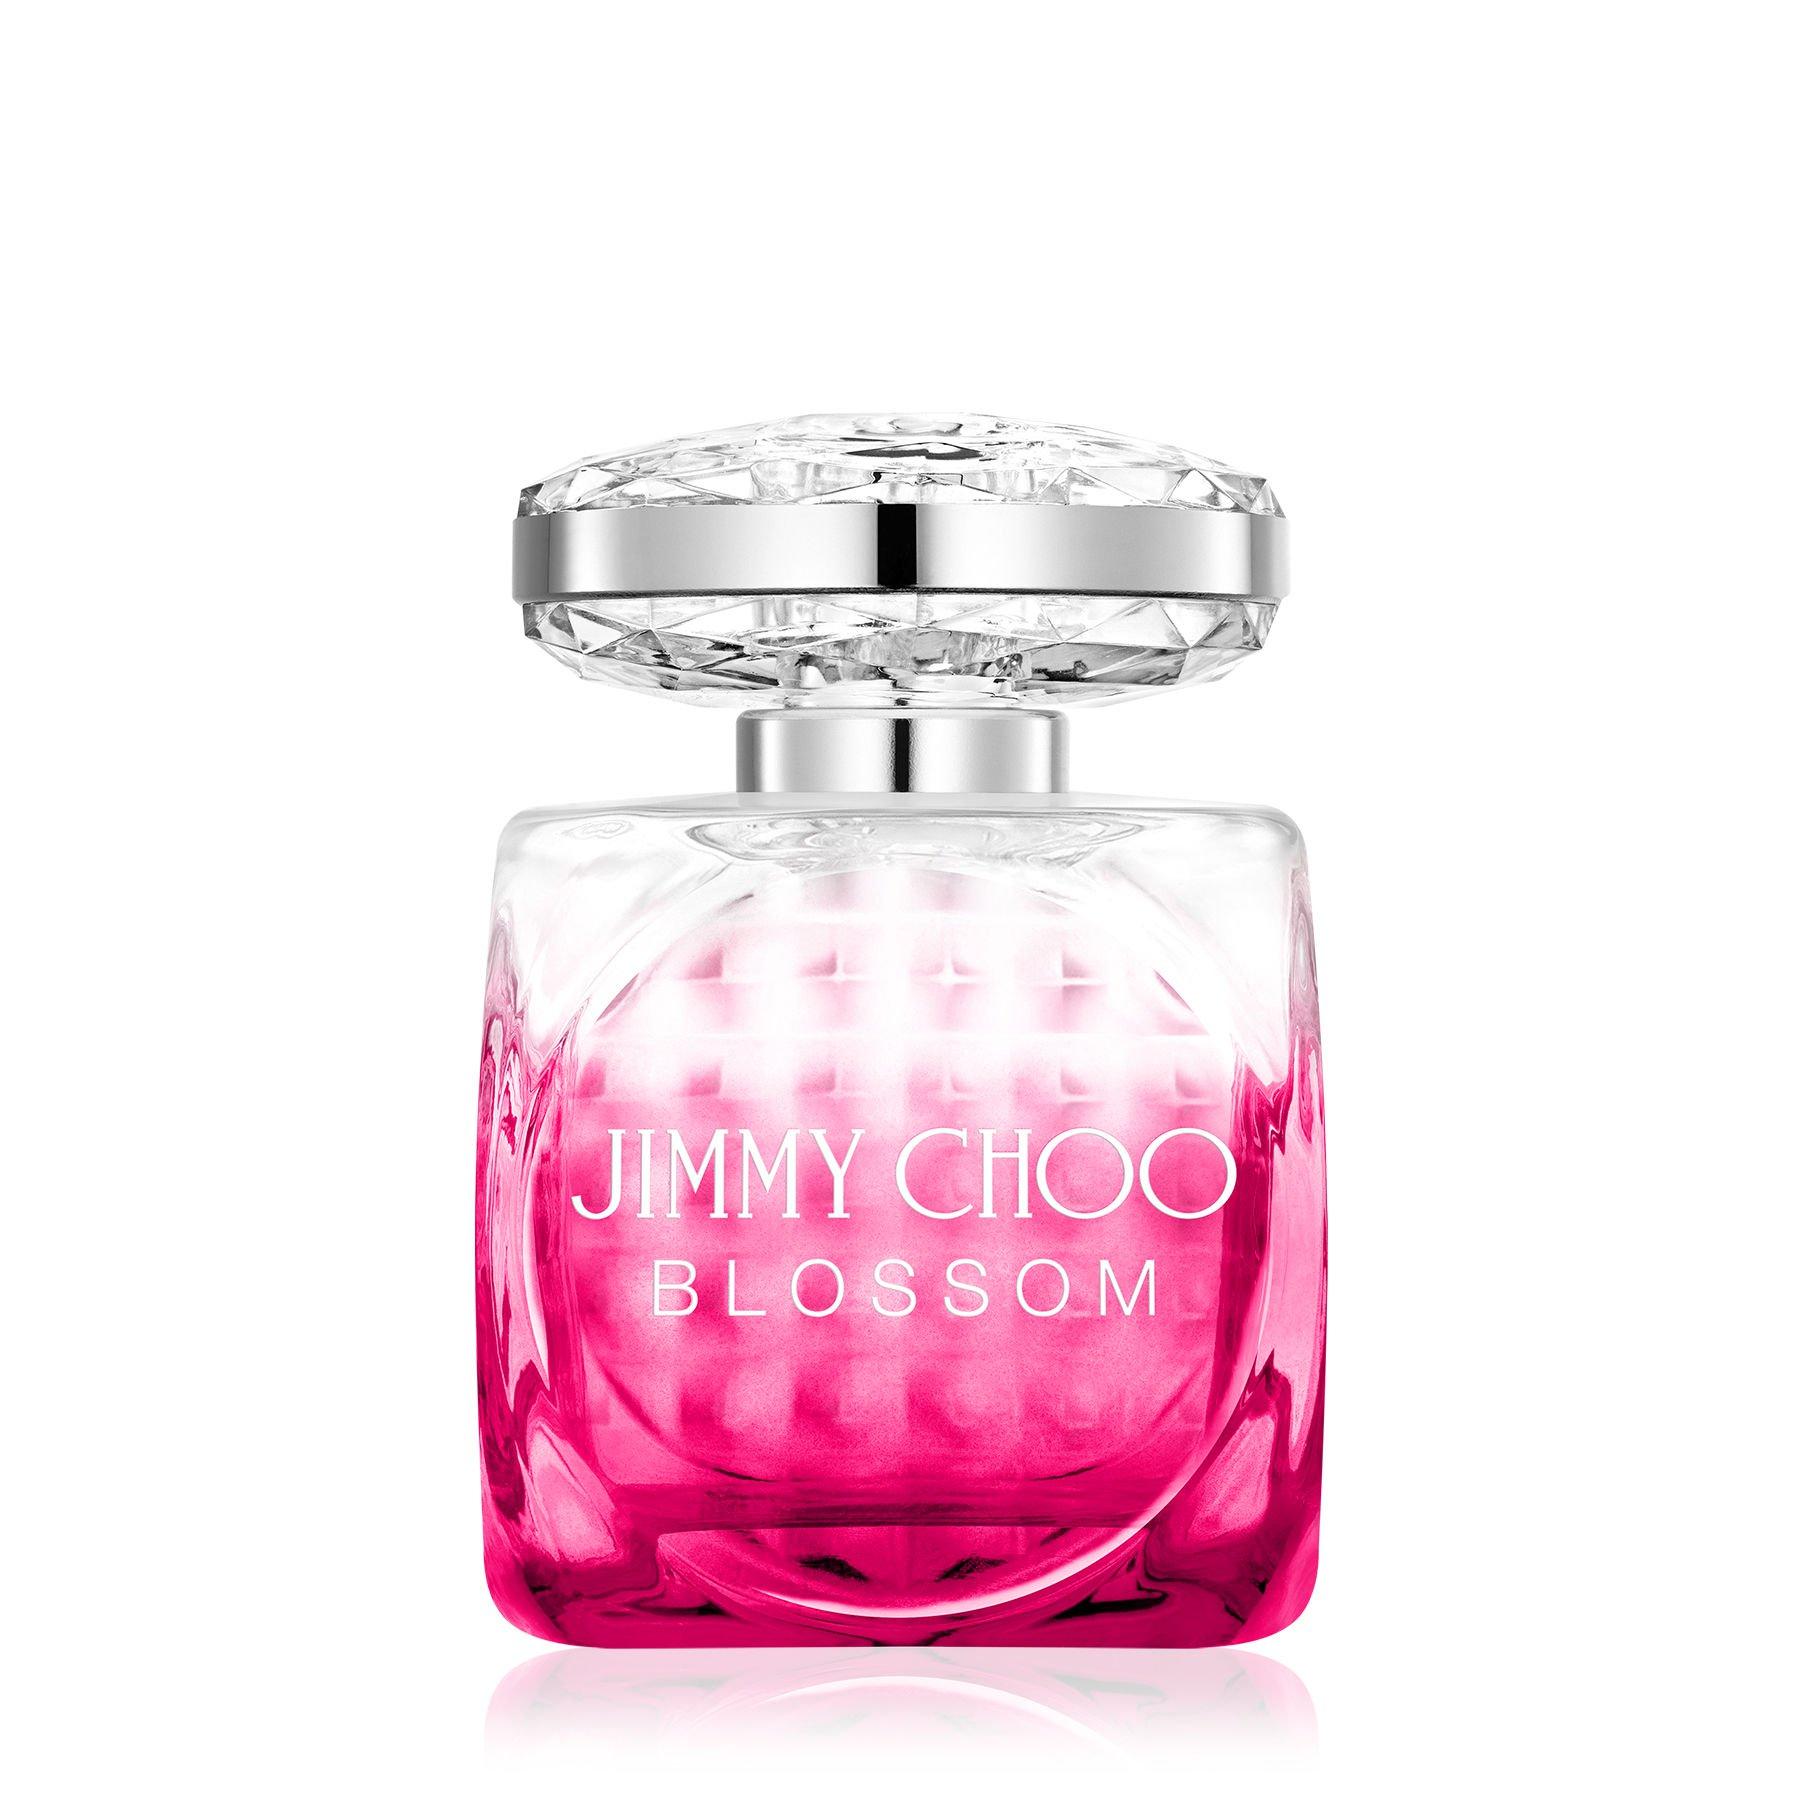 Jimmy Choo - Blossom EDP 100 ml